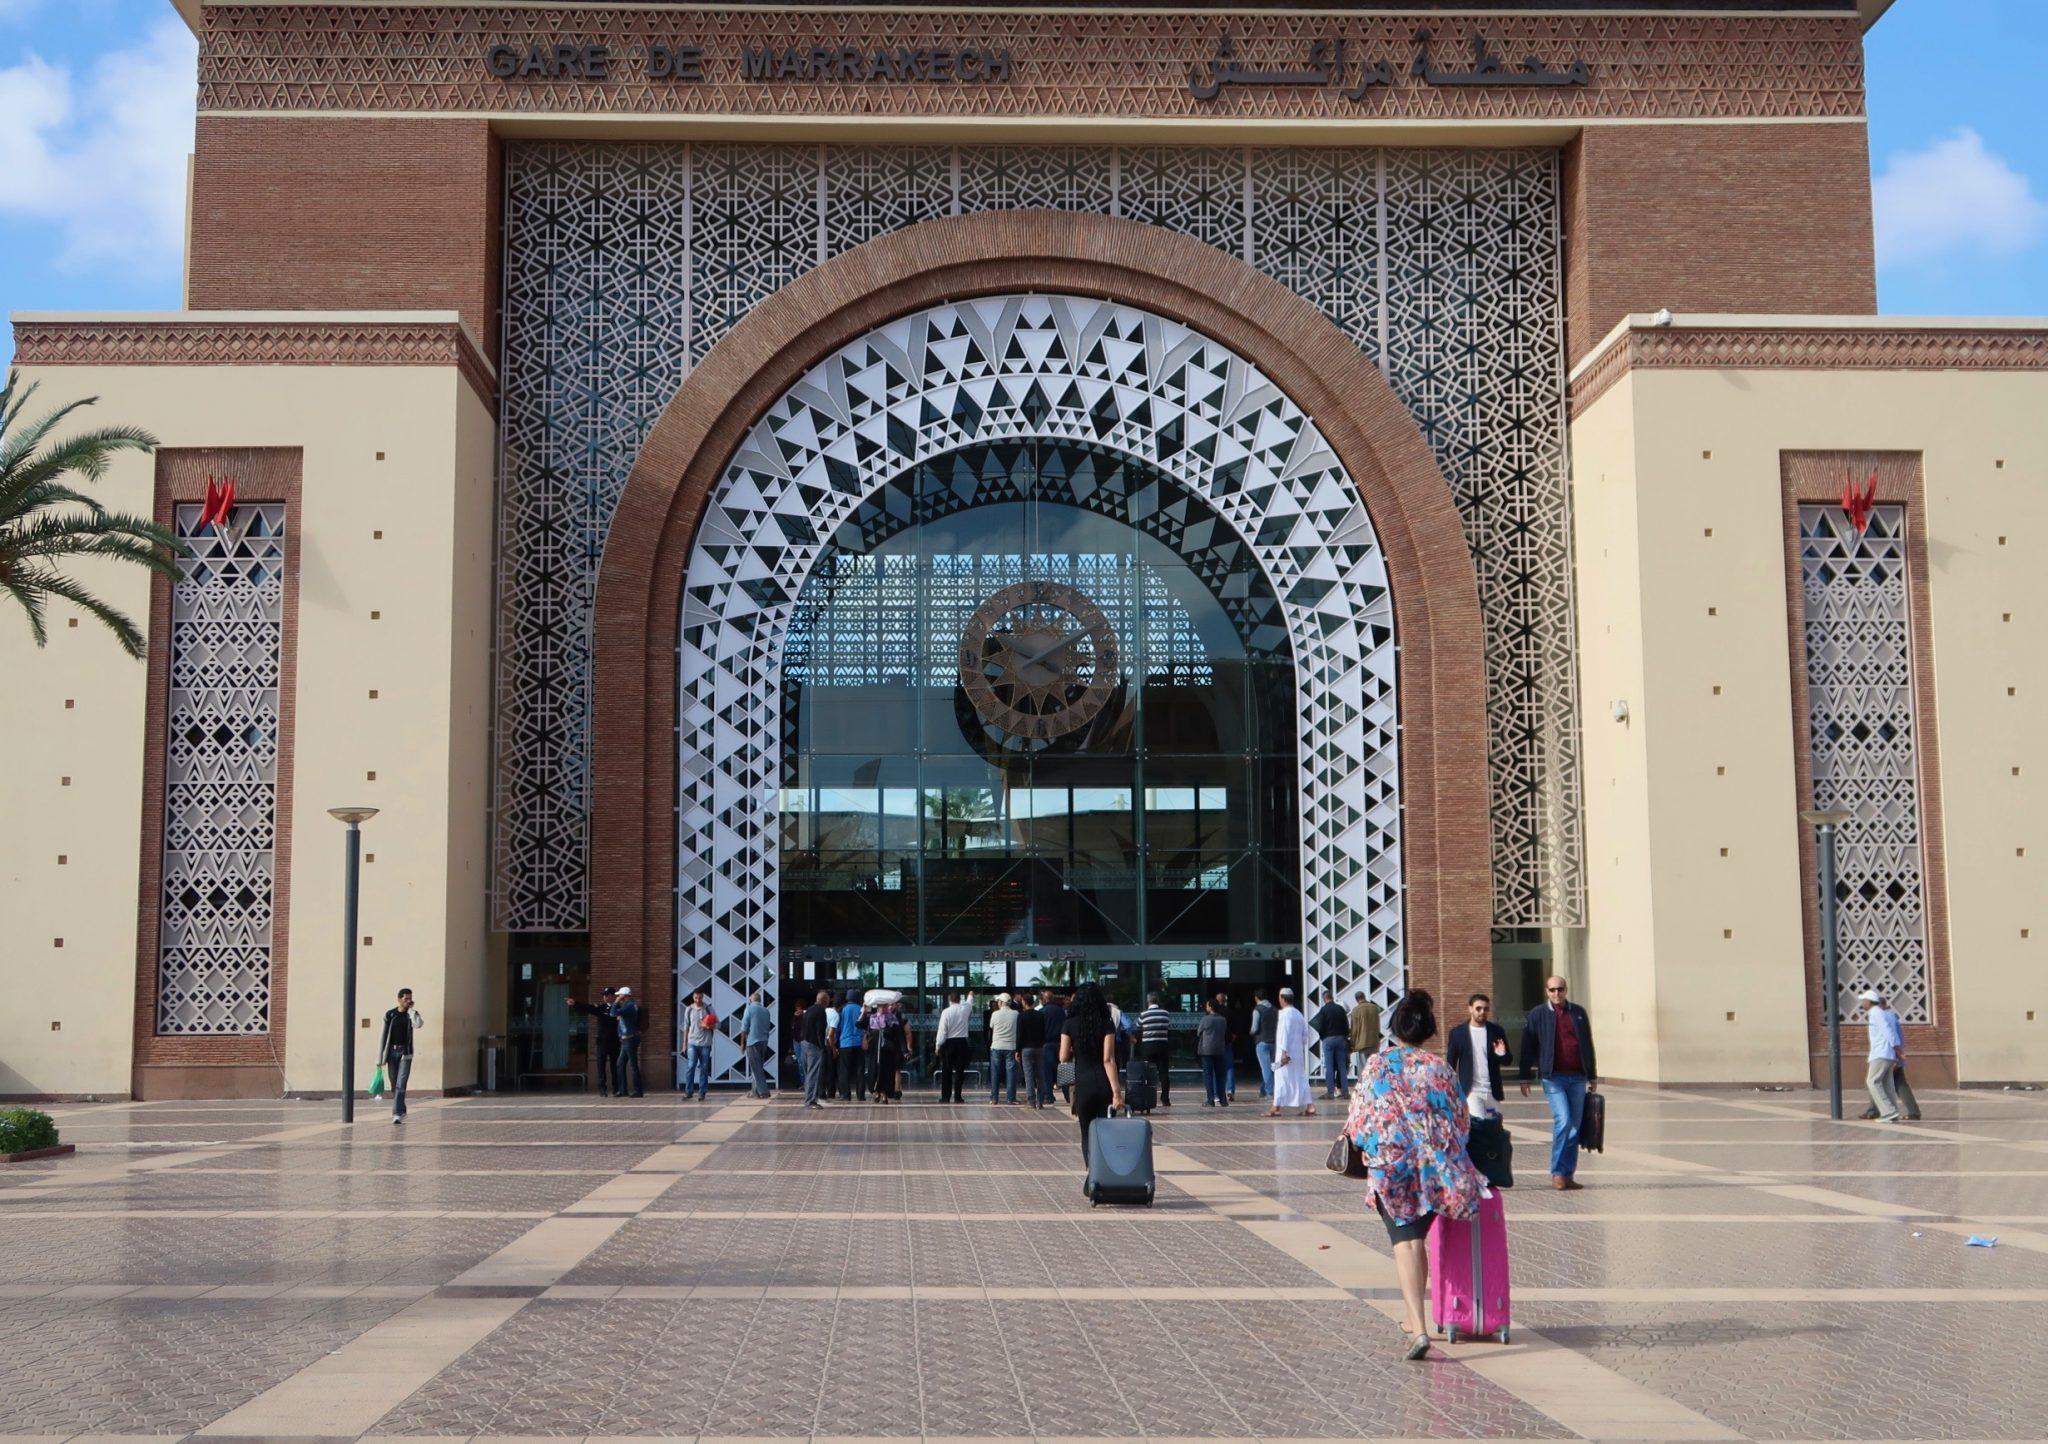 Marrakech rautatieasema